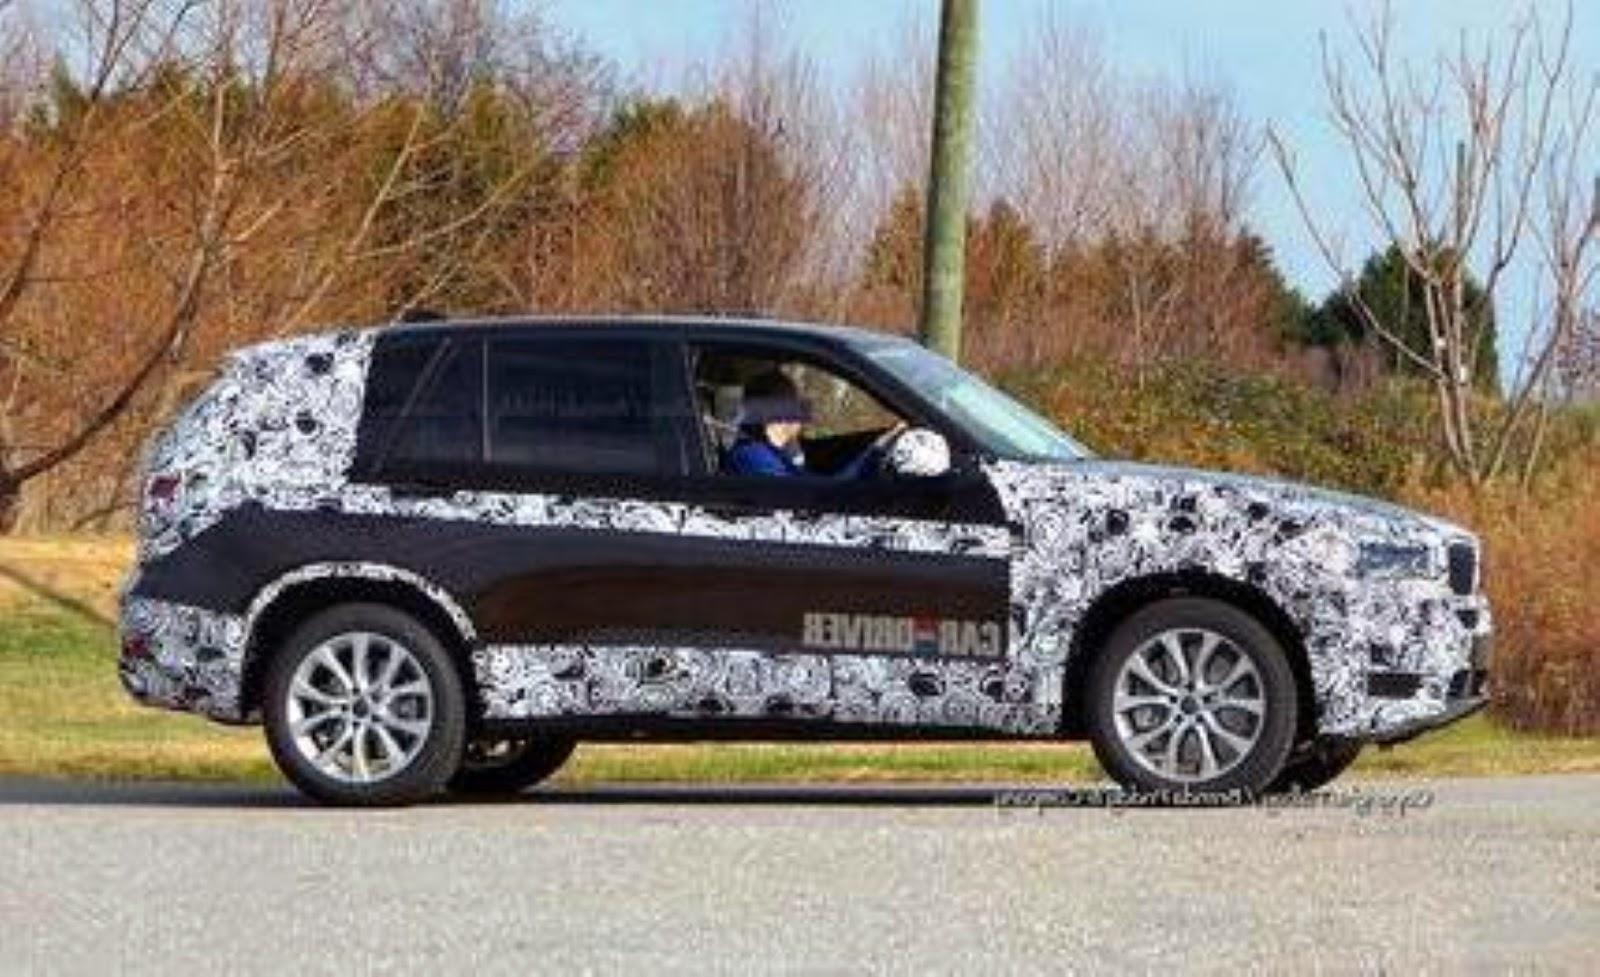 2014 Bmw X7 Car Wallpaper High Quality